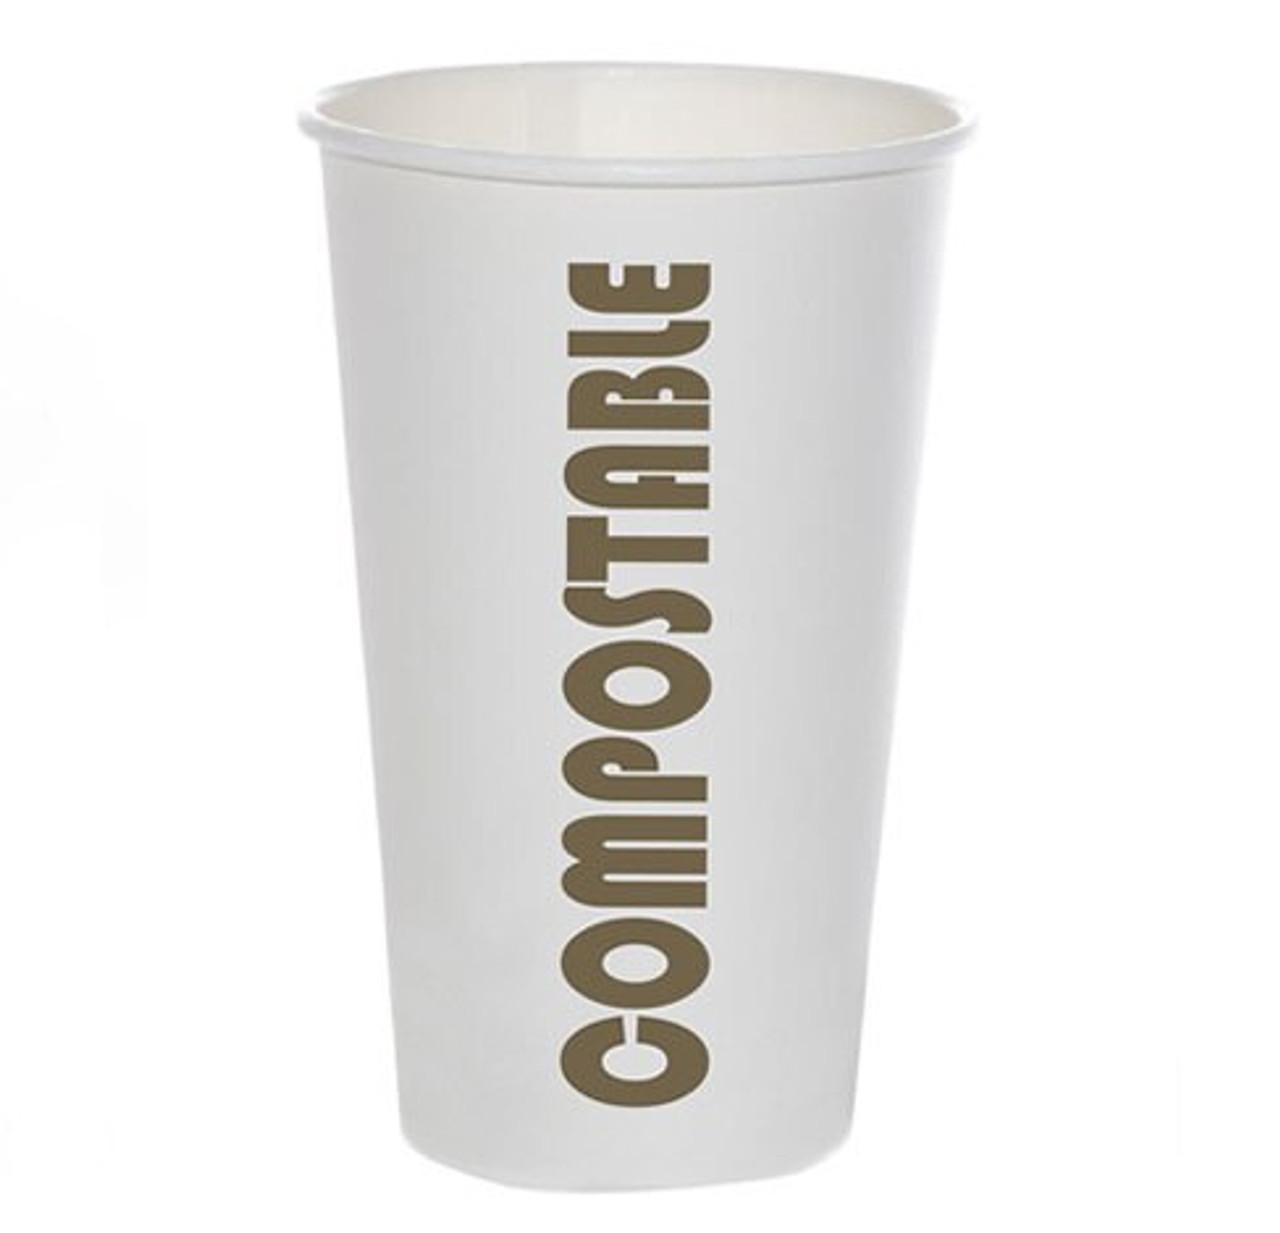 20oz Coffee Cup Compostable Print™ Series